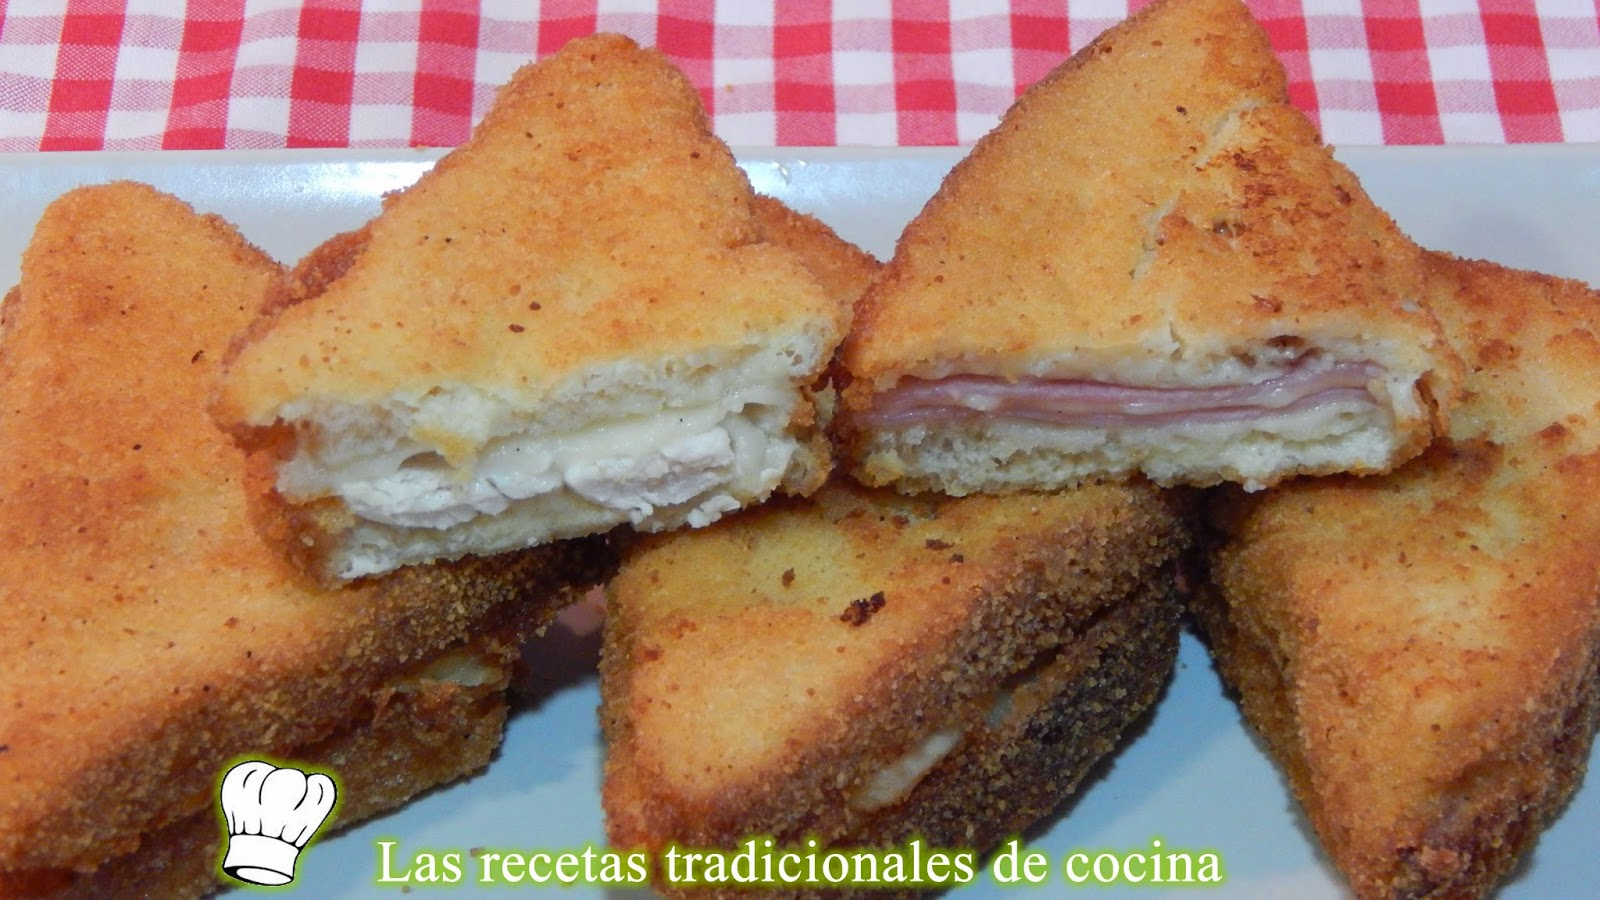 Croque monsieur o sandwich Monte cristo